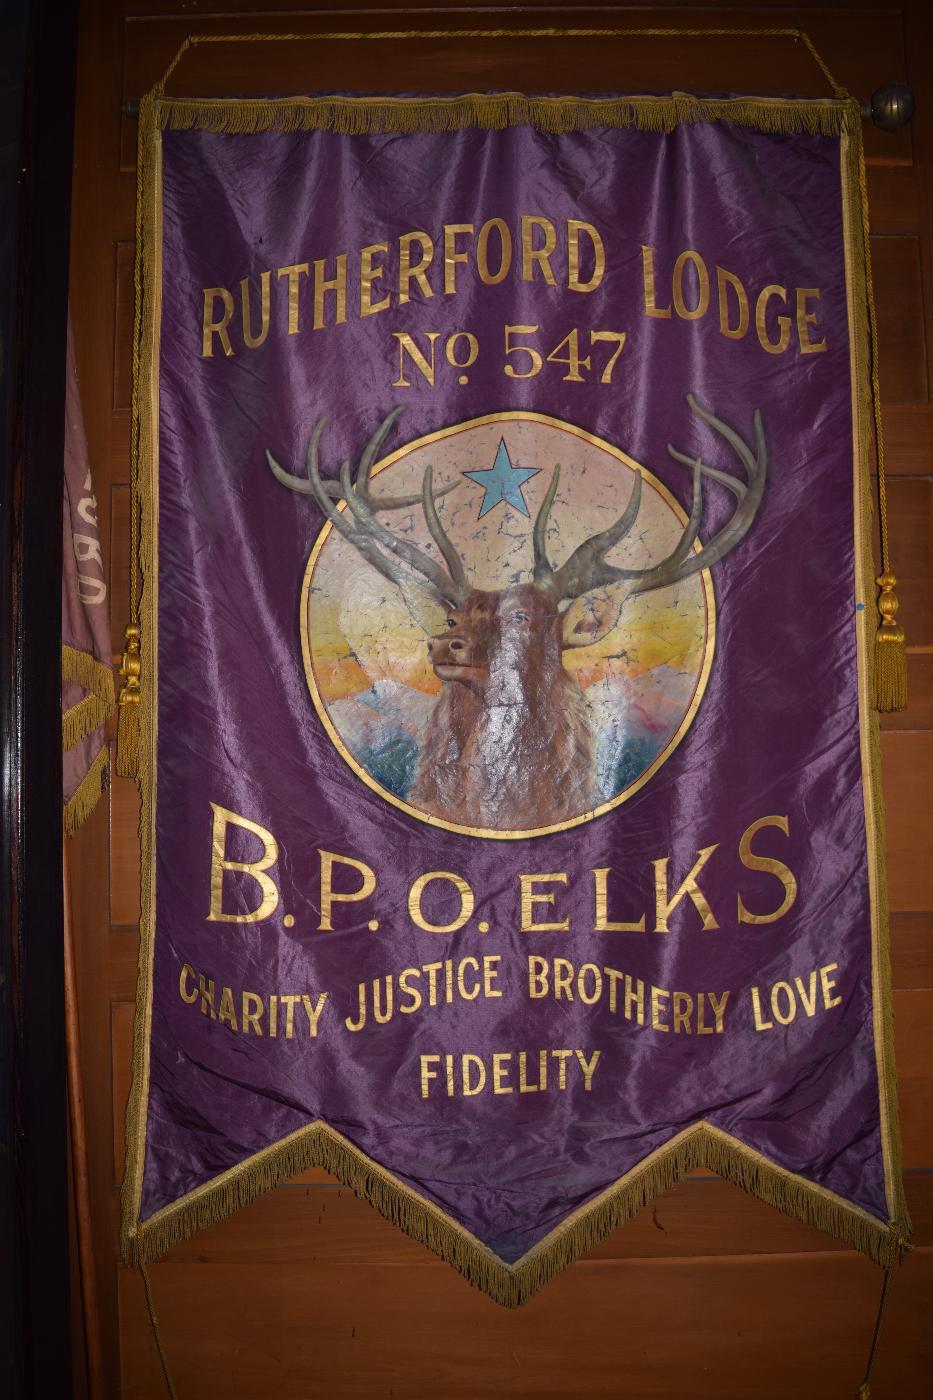 Our original banner